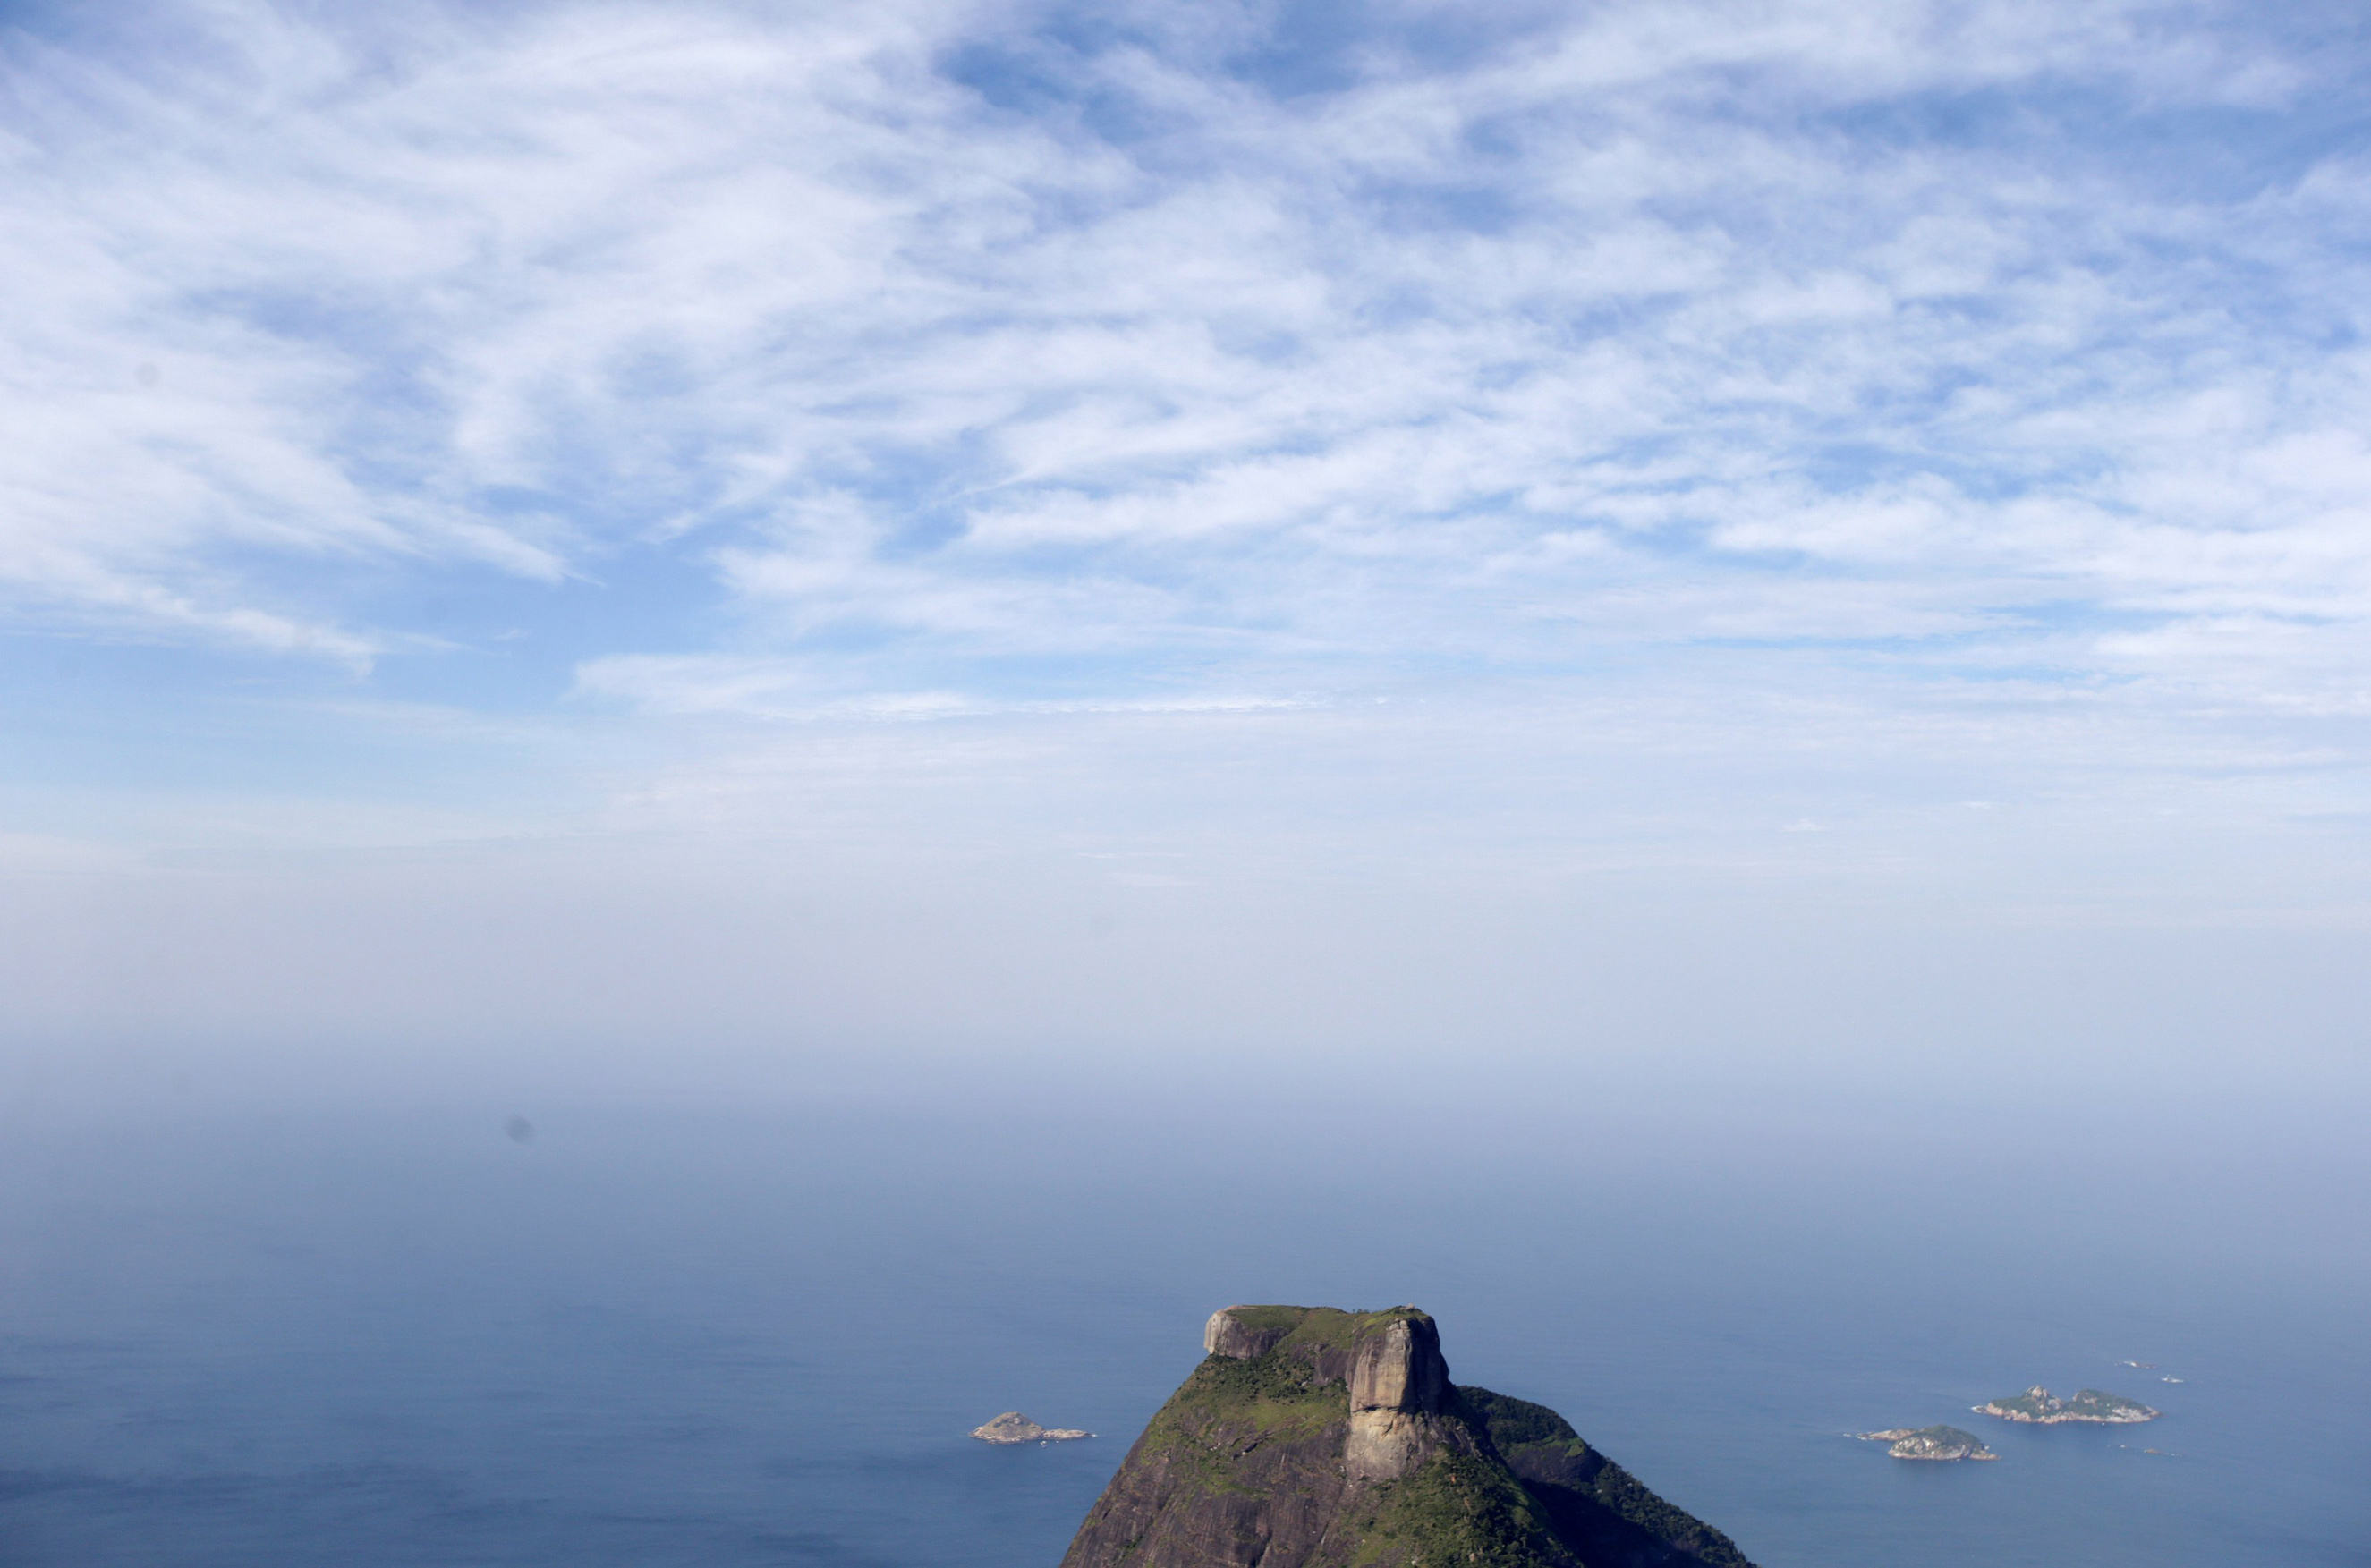 An aerial view shows the Pedra da Gavea mountain in Rio de Janeiro on July 16, 2016.